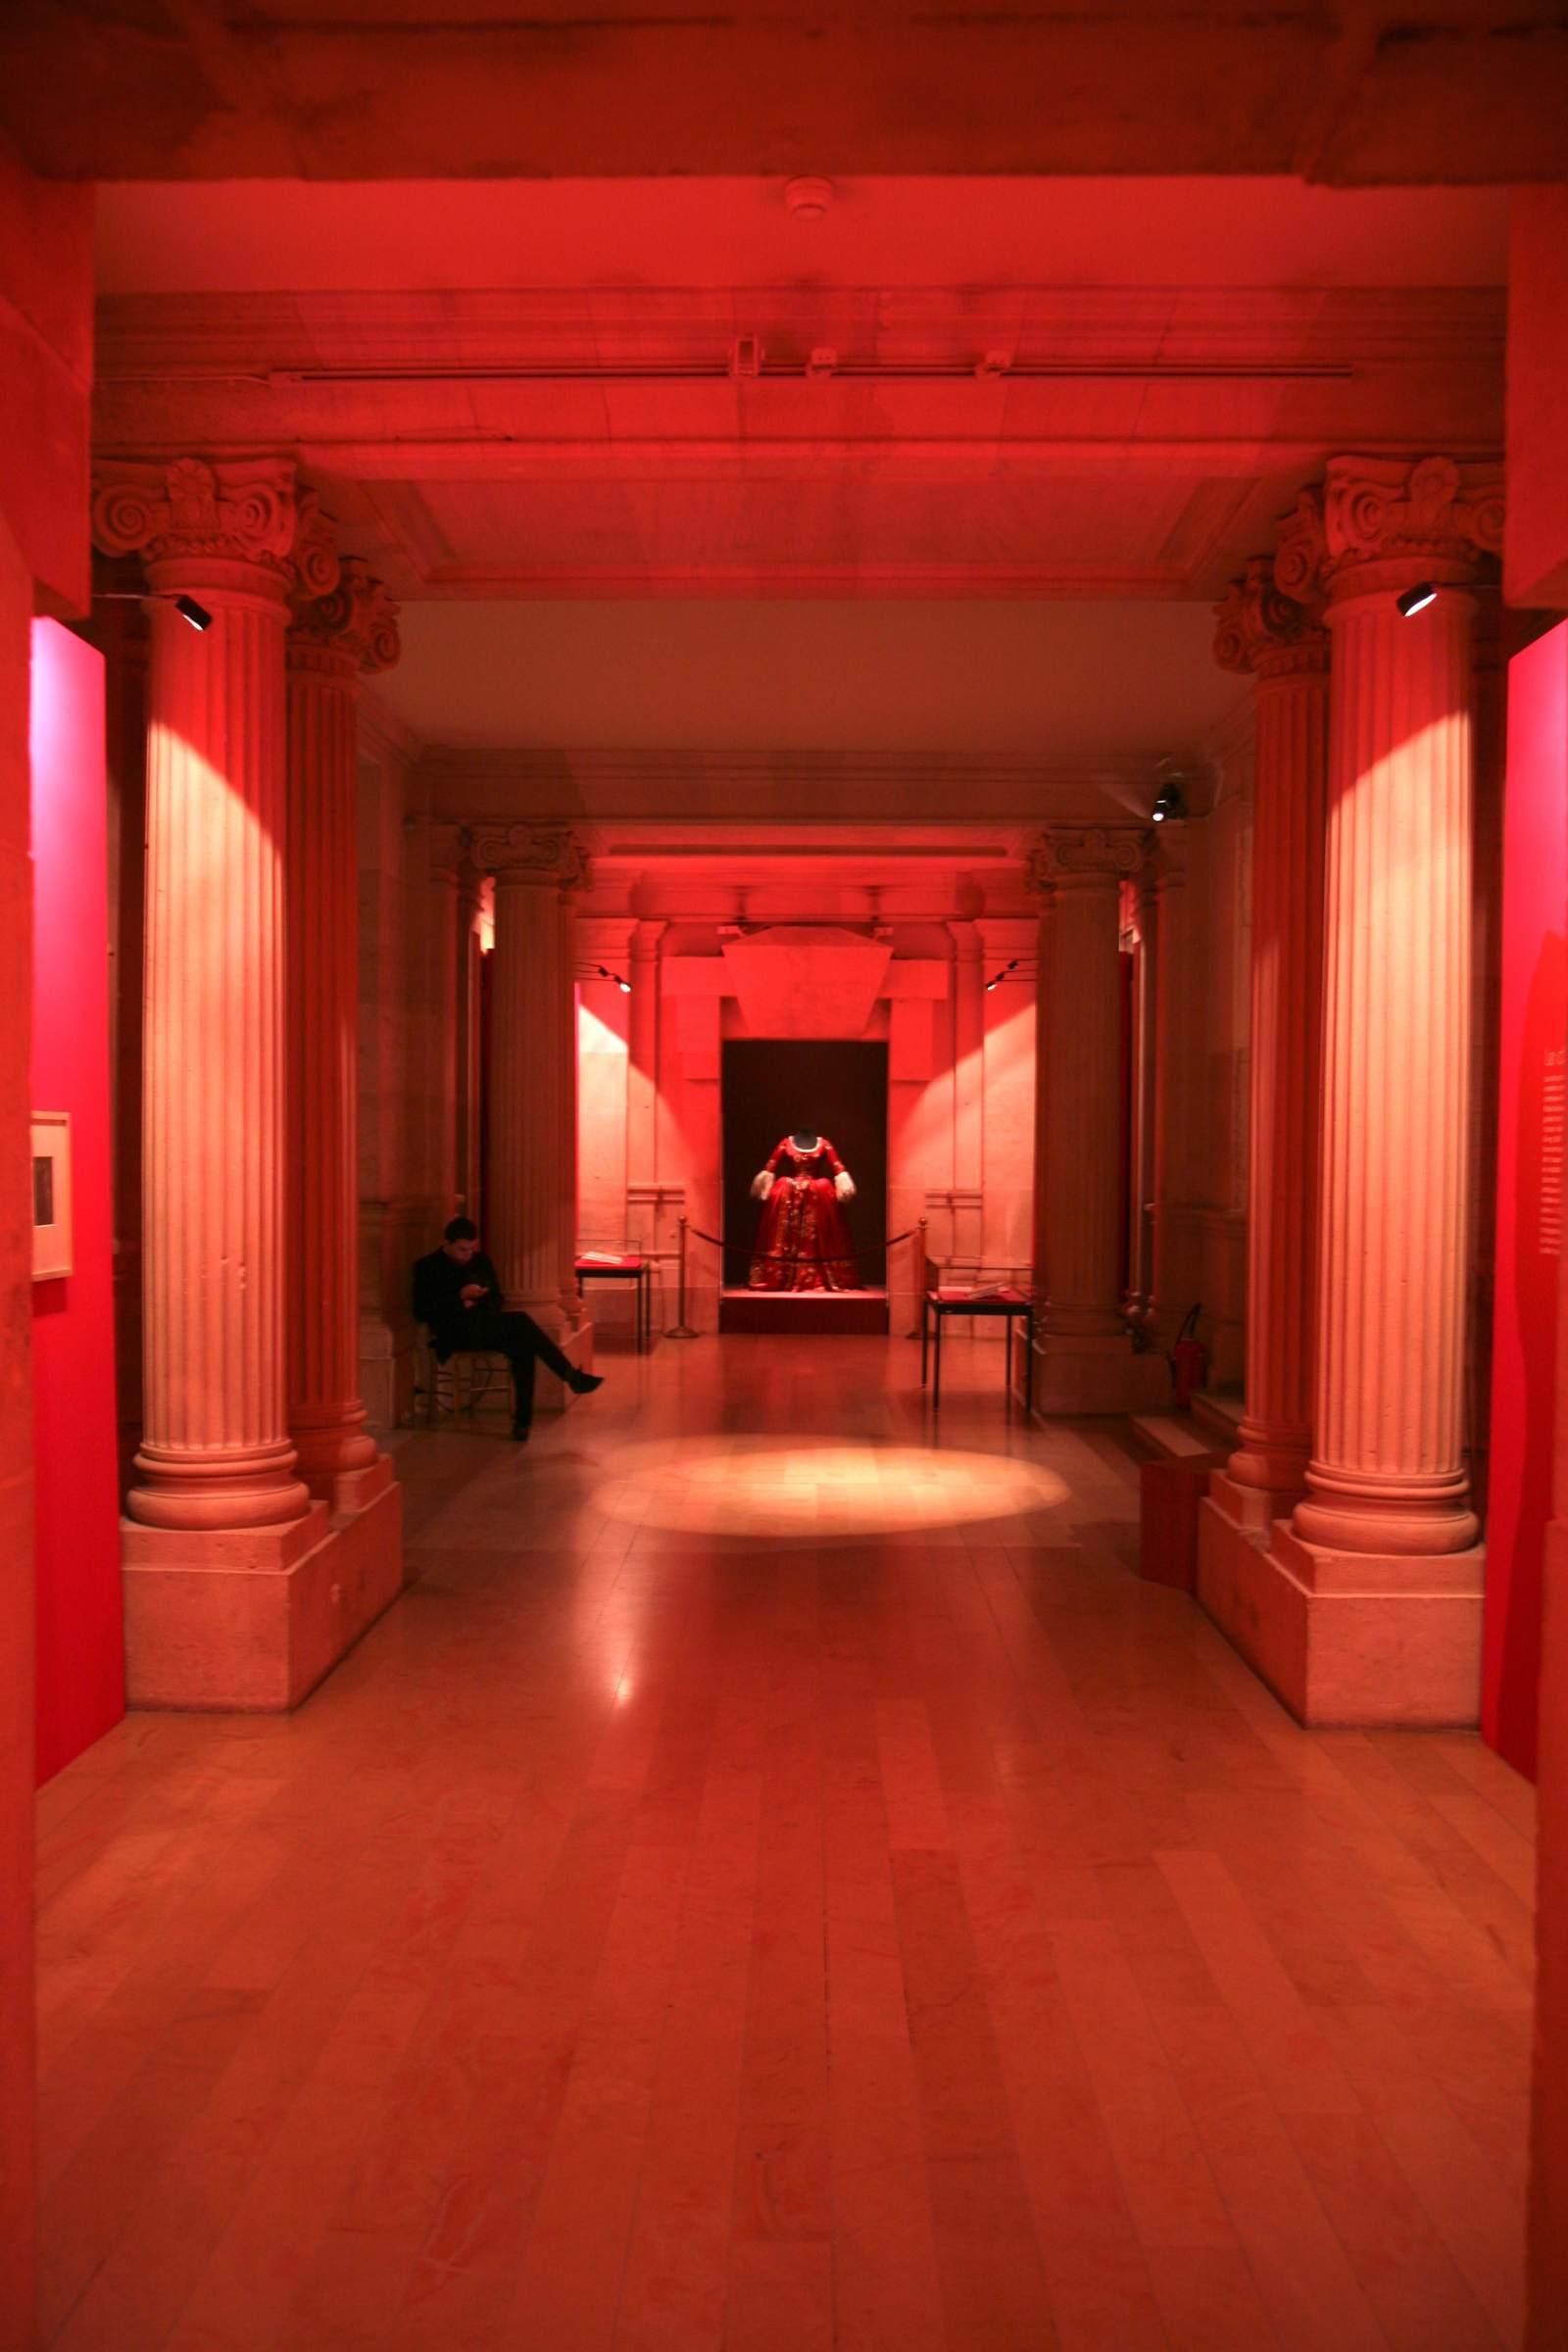 opera library museum The Paris Opera Library Museum